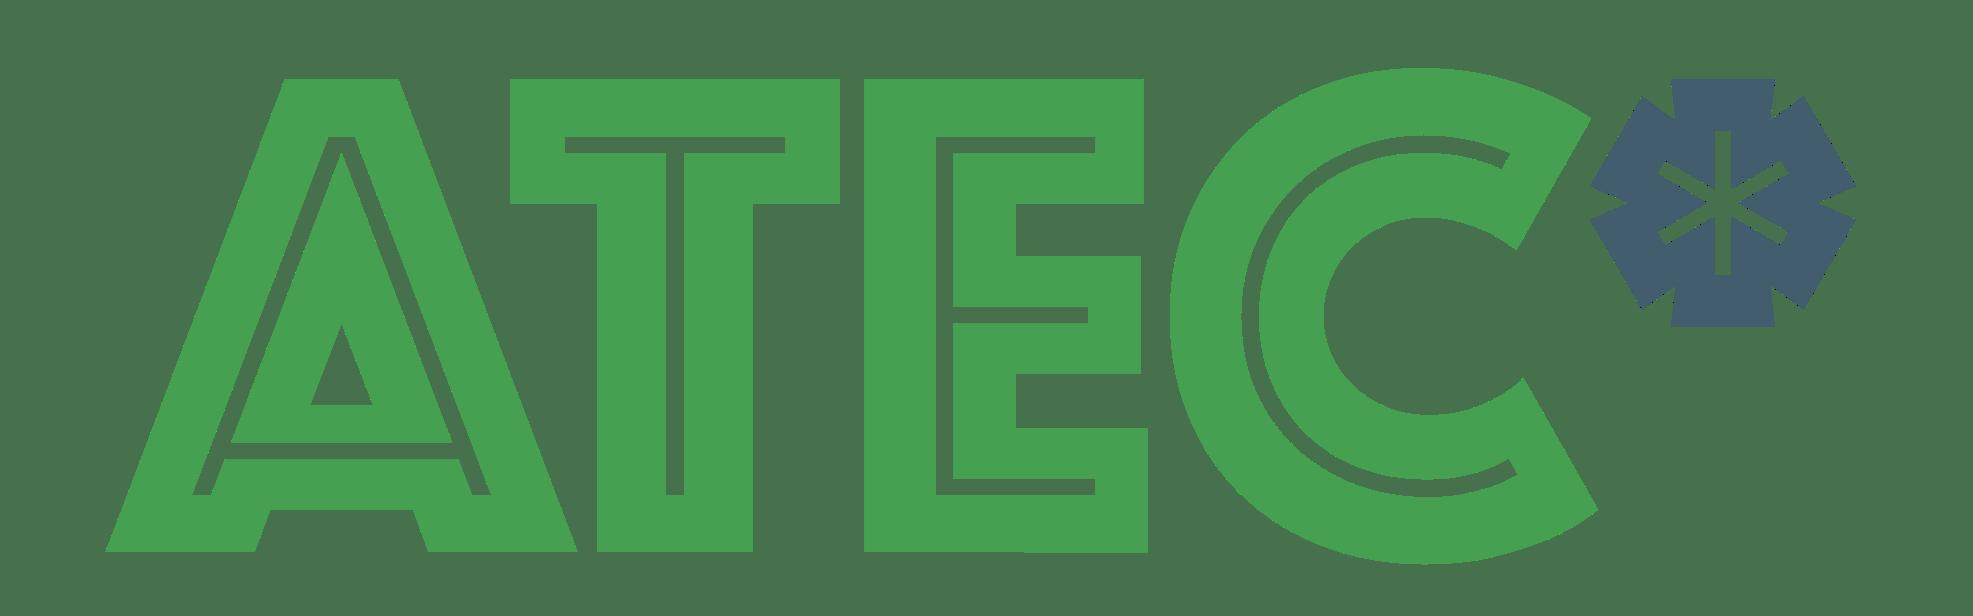 ATEC Biodigesters company logo